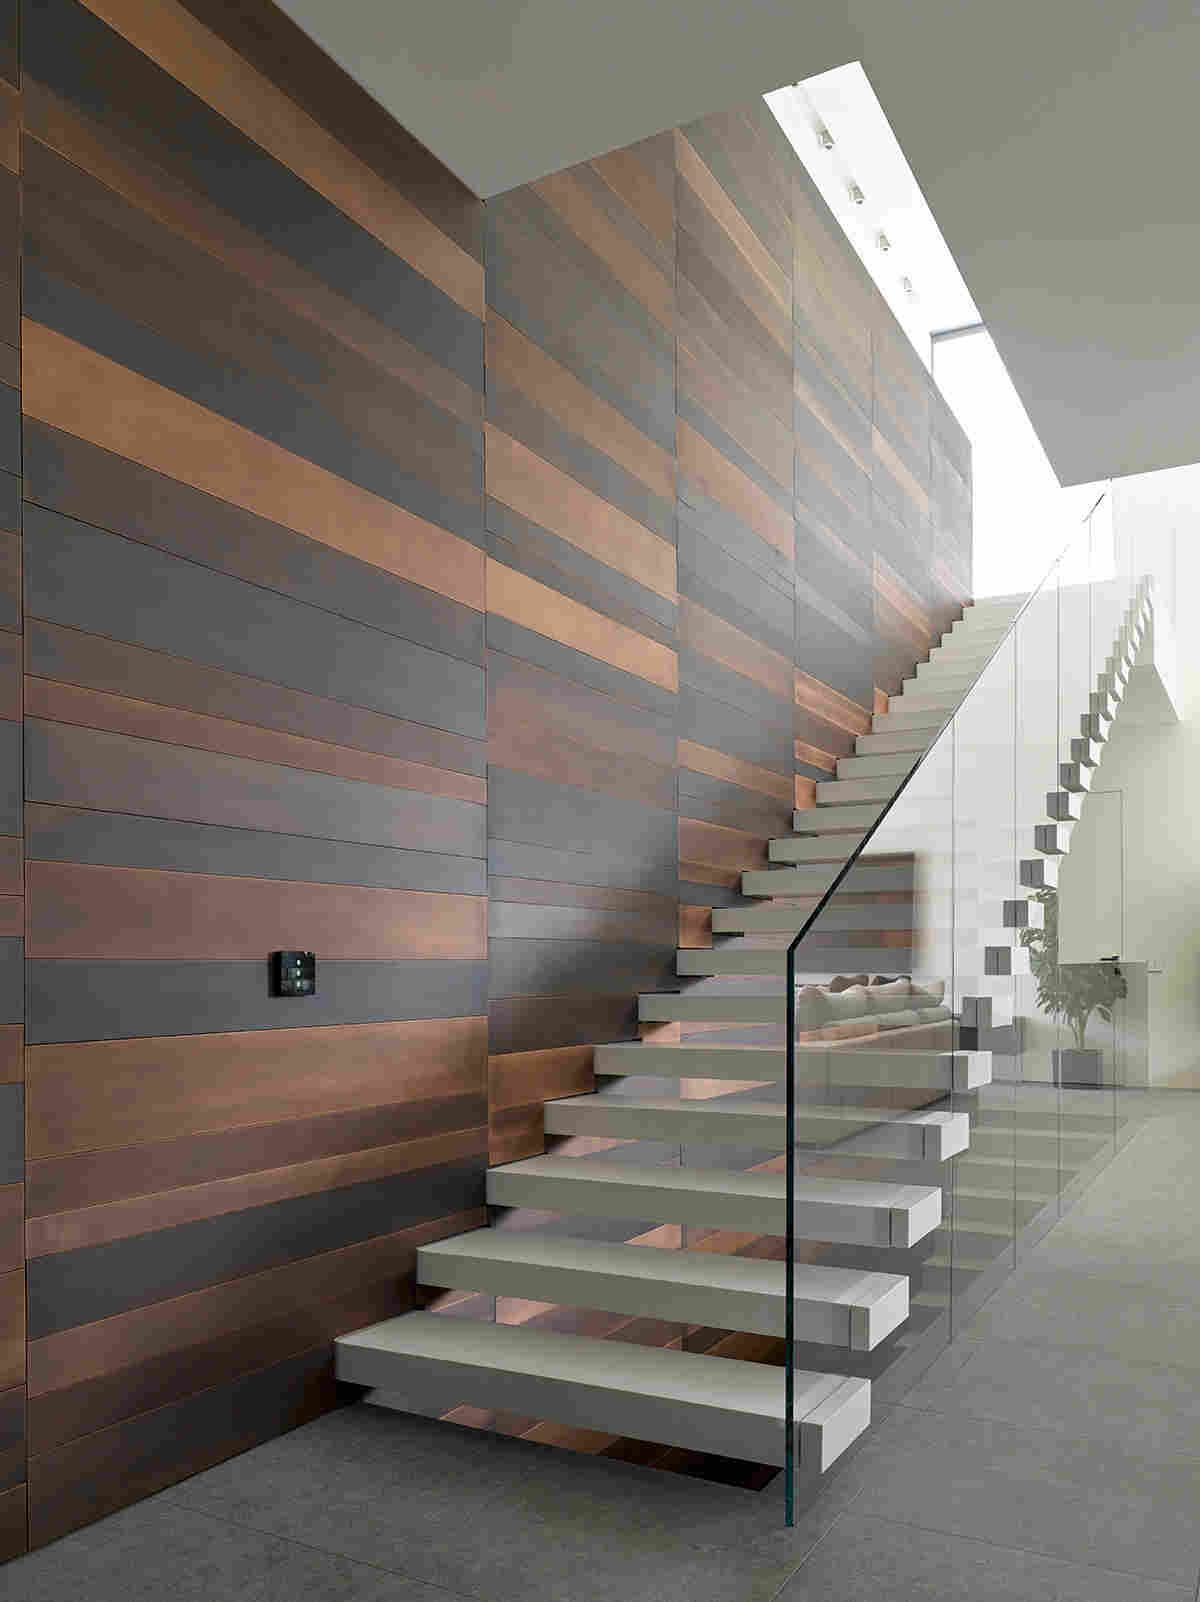 Künstlerisch Schwebende Treppe Beste Wahl · Загородный дом в Марфино от Александры